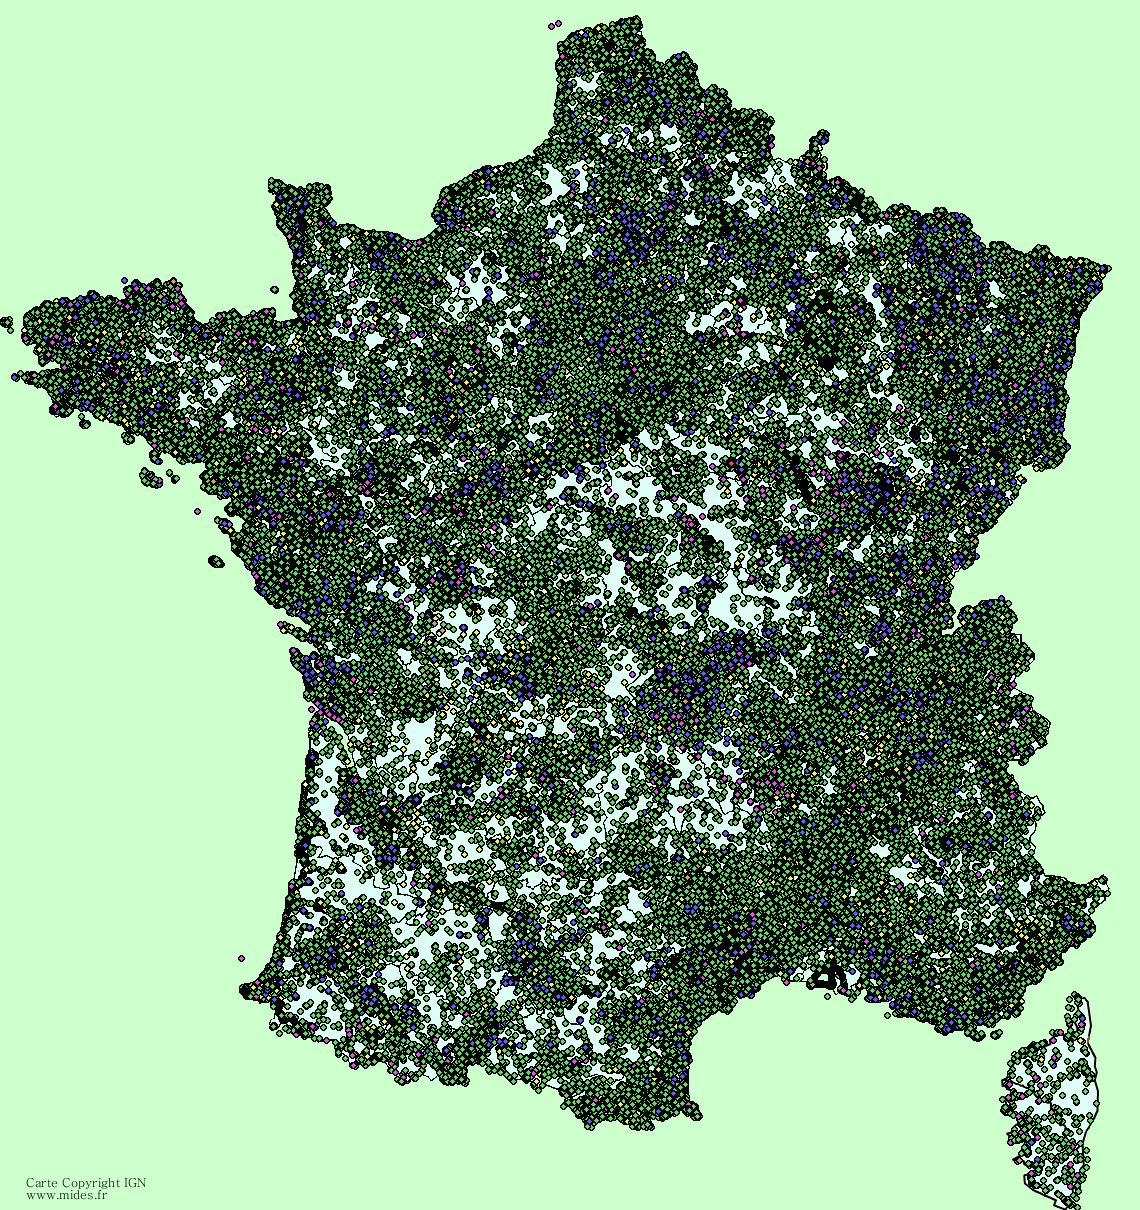 Carte intéractive des caches existantes en France